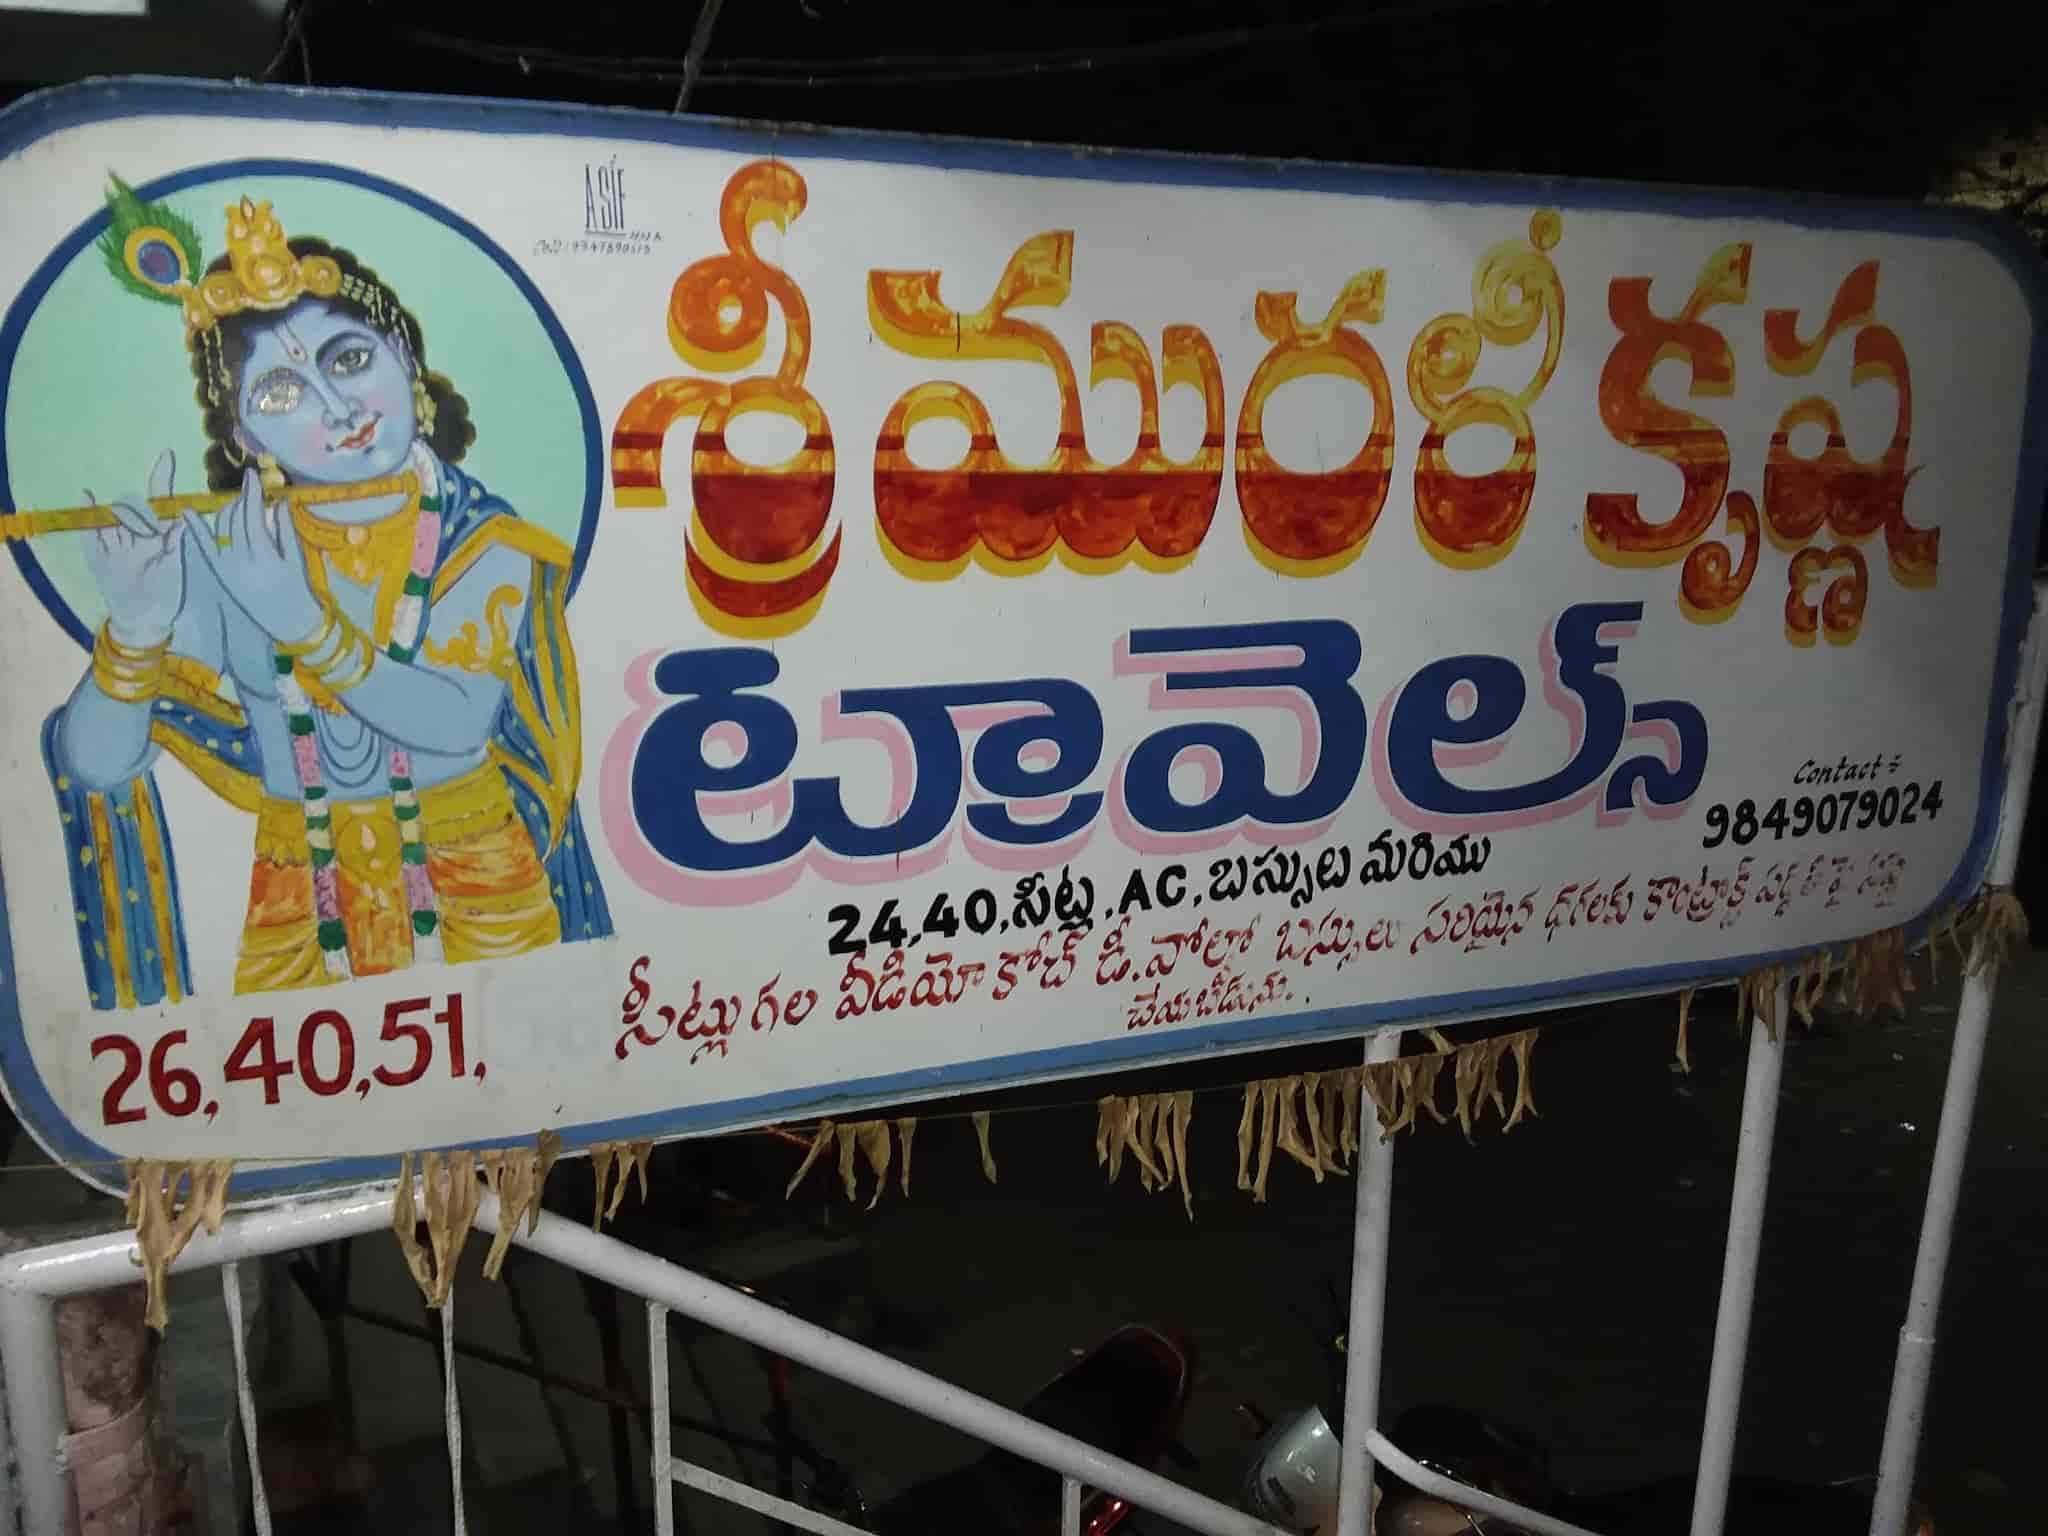 Sri Murali Krishnatravels, Hanamkonda - Travel Agents in Warangal